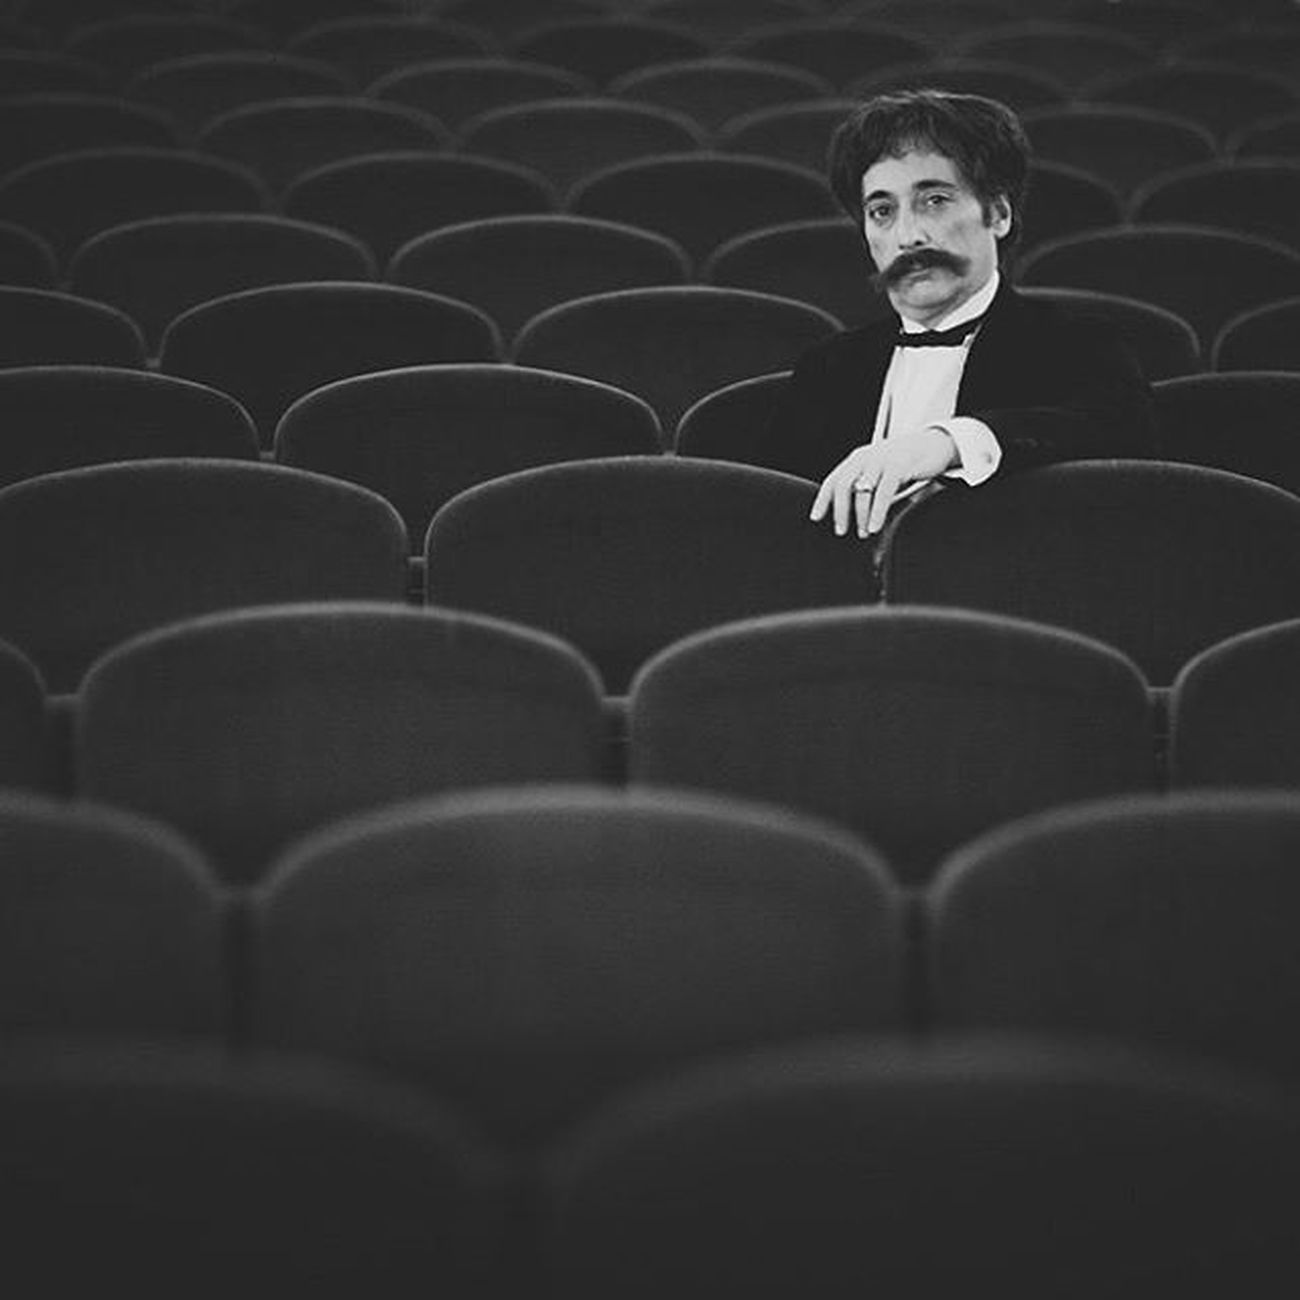 Sarasate Portrait Blackandwhite Photographie  Violin Teatrogayarre Miguelgoni